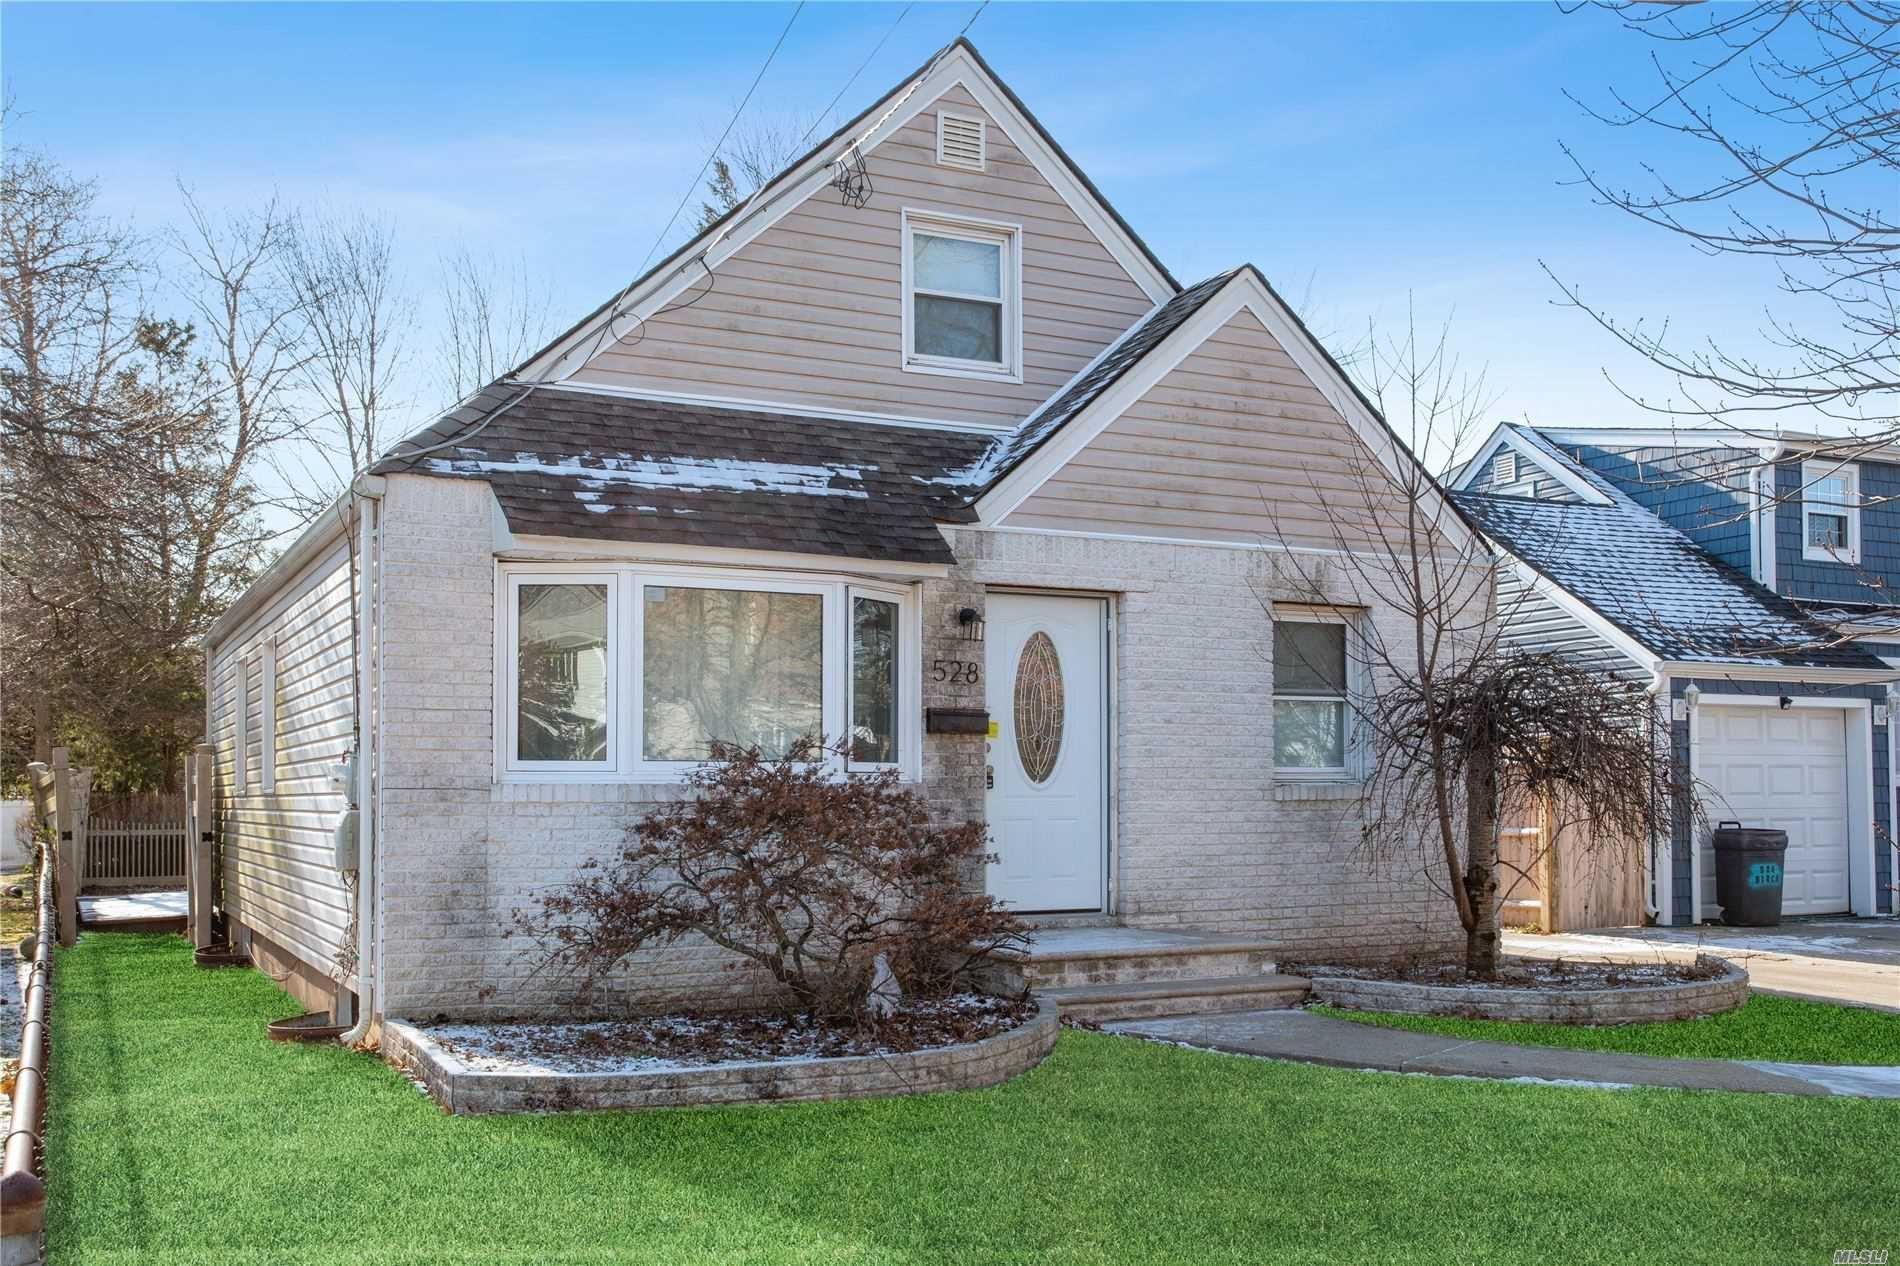 528 Birch Street, West Hempstead, NY 11552 - MLS#: 3211985